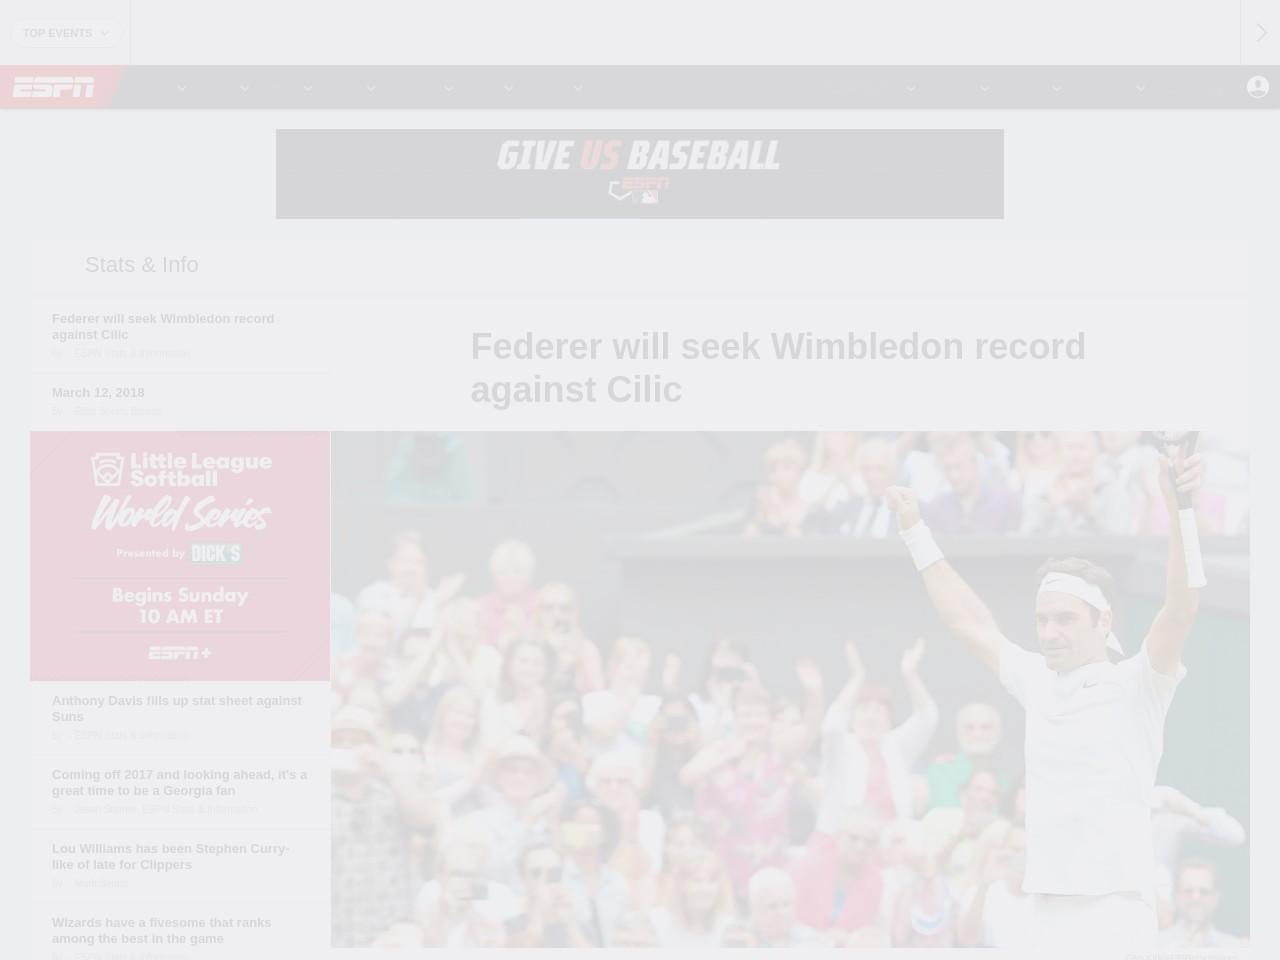 Federer will seek Wimbledon record against Cilic